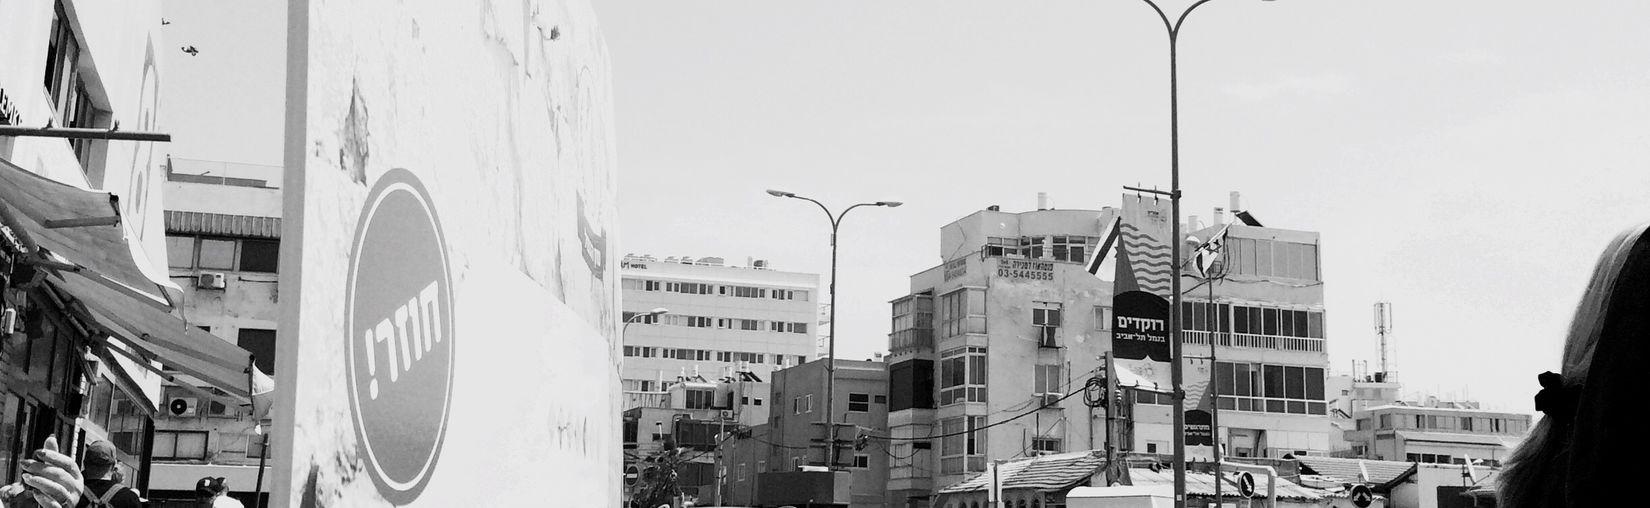 Welcome To Black Tel Aviv Port Port